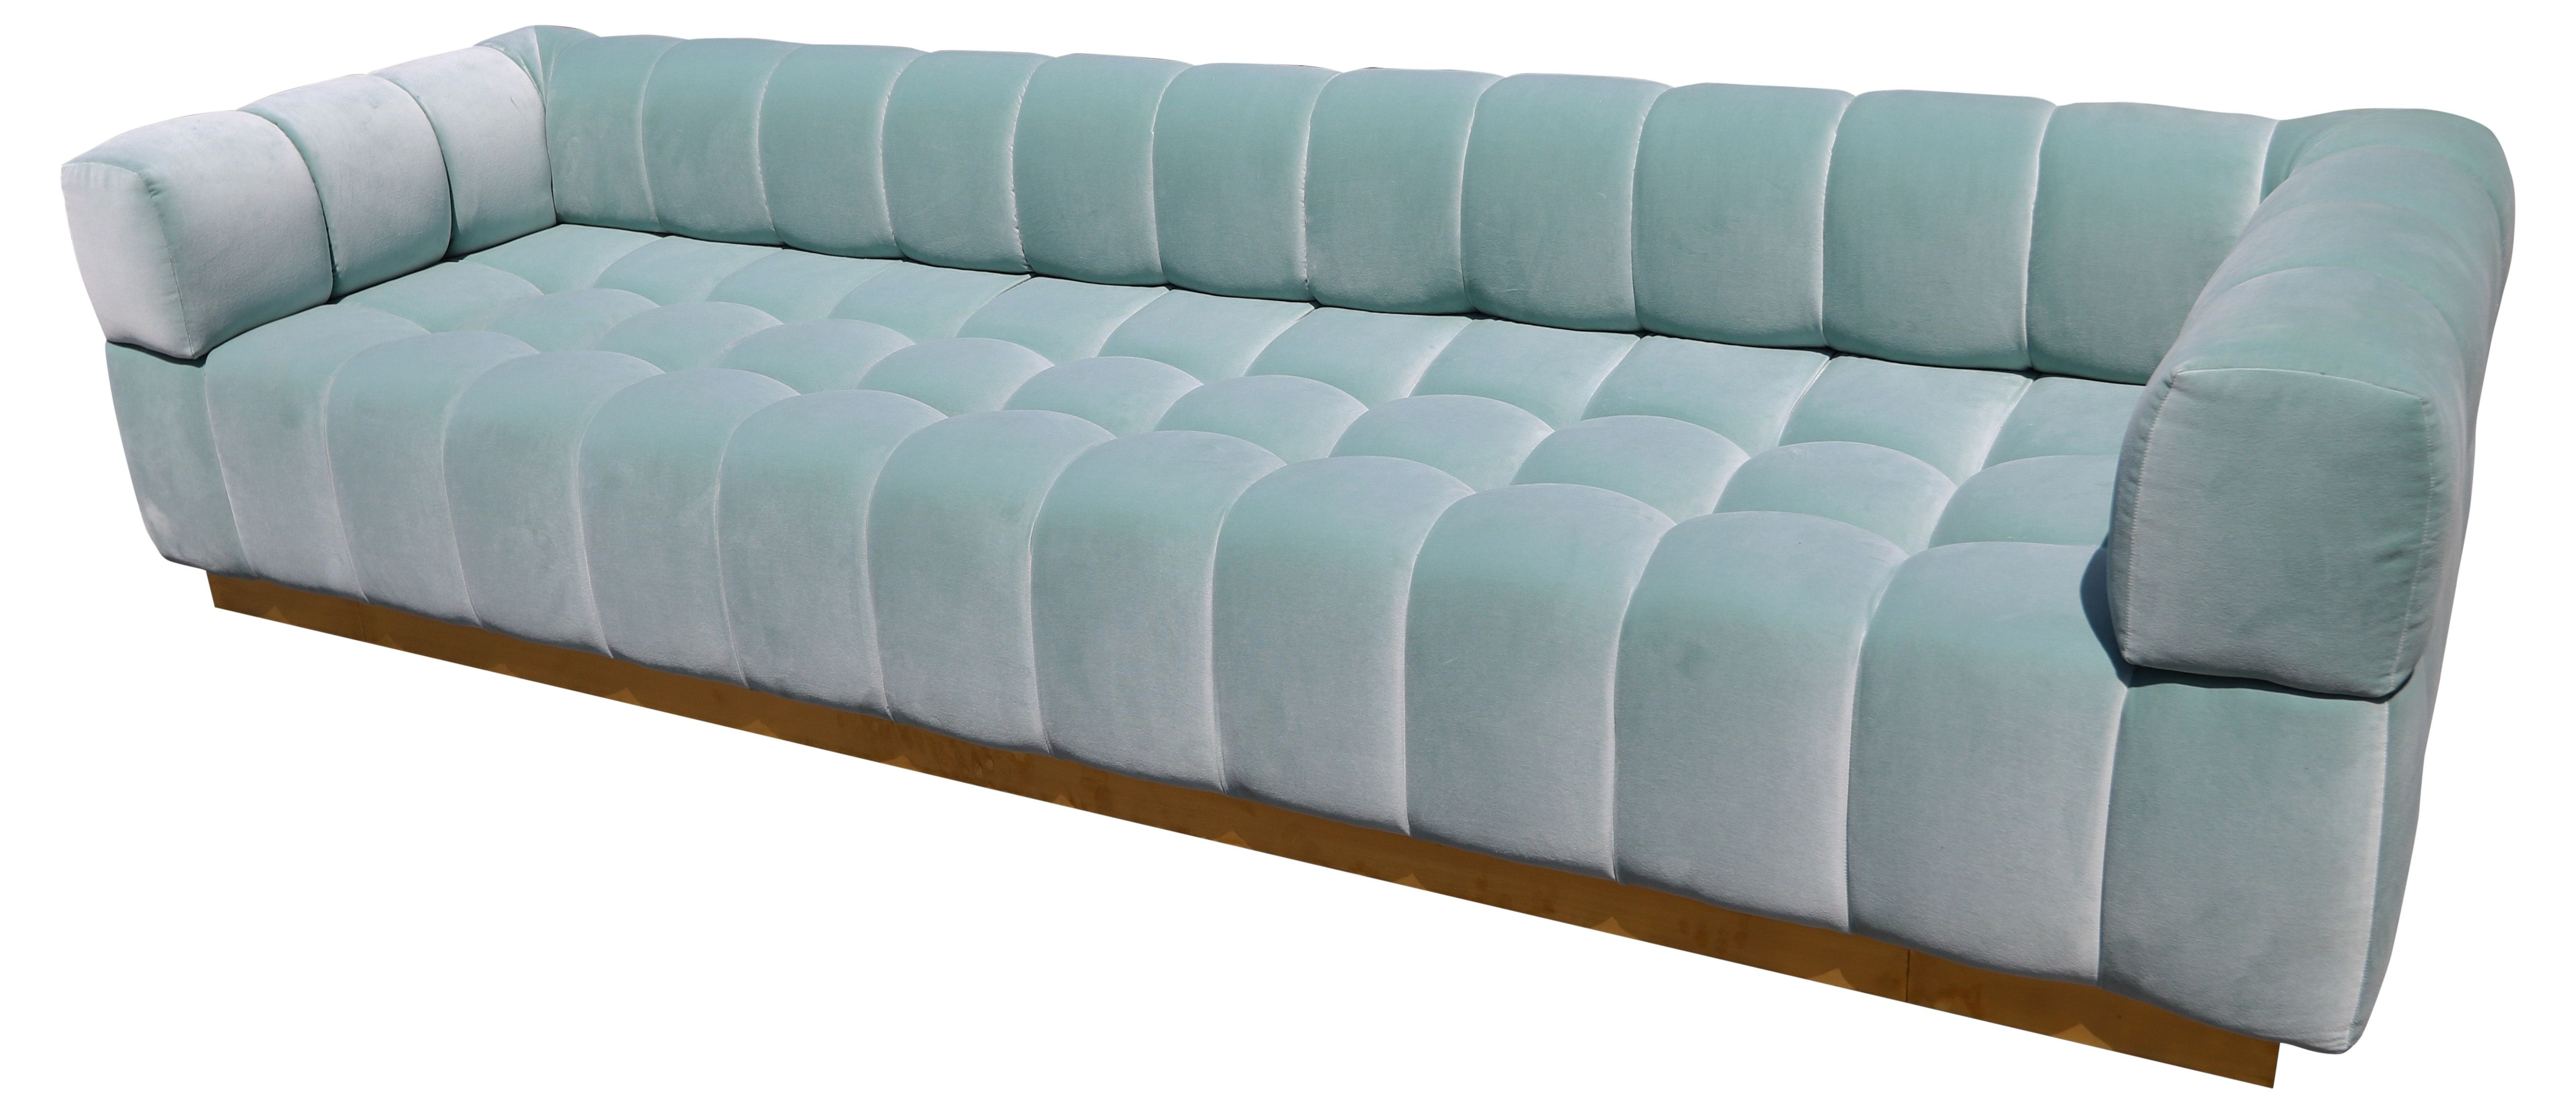 Pleasing Custom Tufted Aqua Blue Velvet Sofa With Brass Bas Cjindustries Chair Design For Home Cjindustriesco